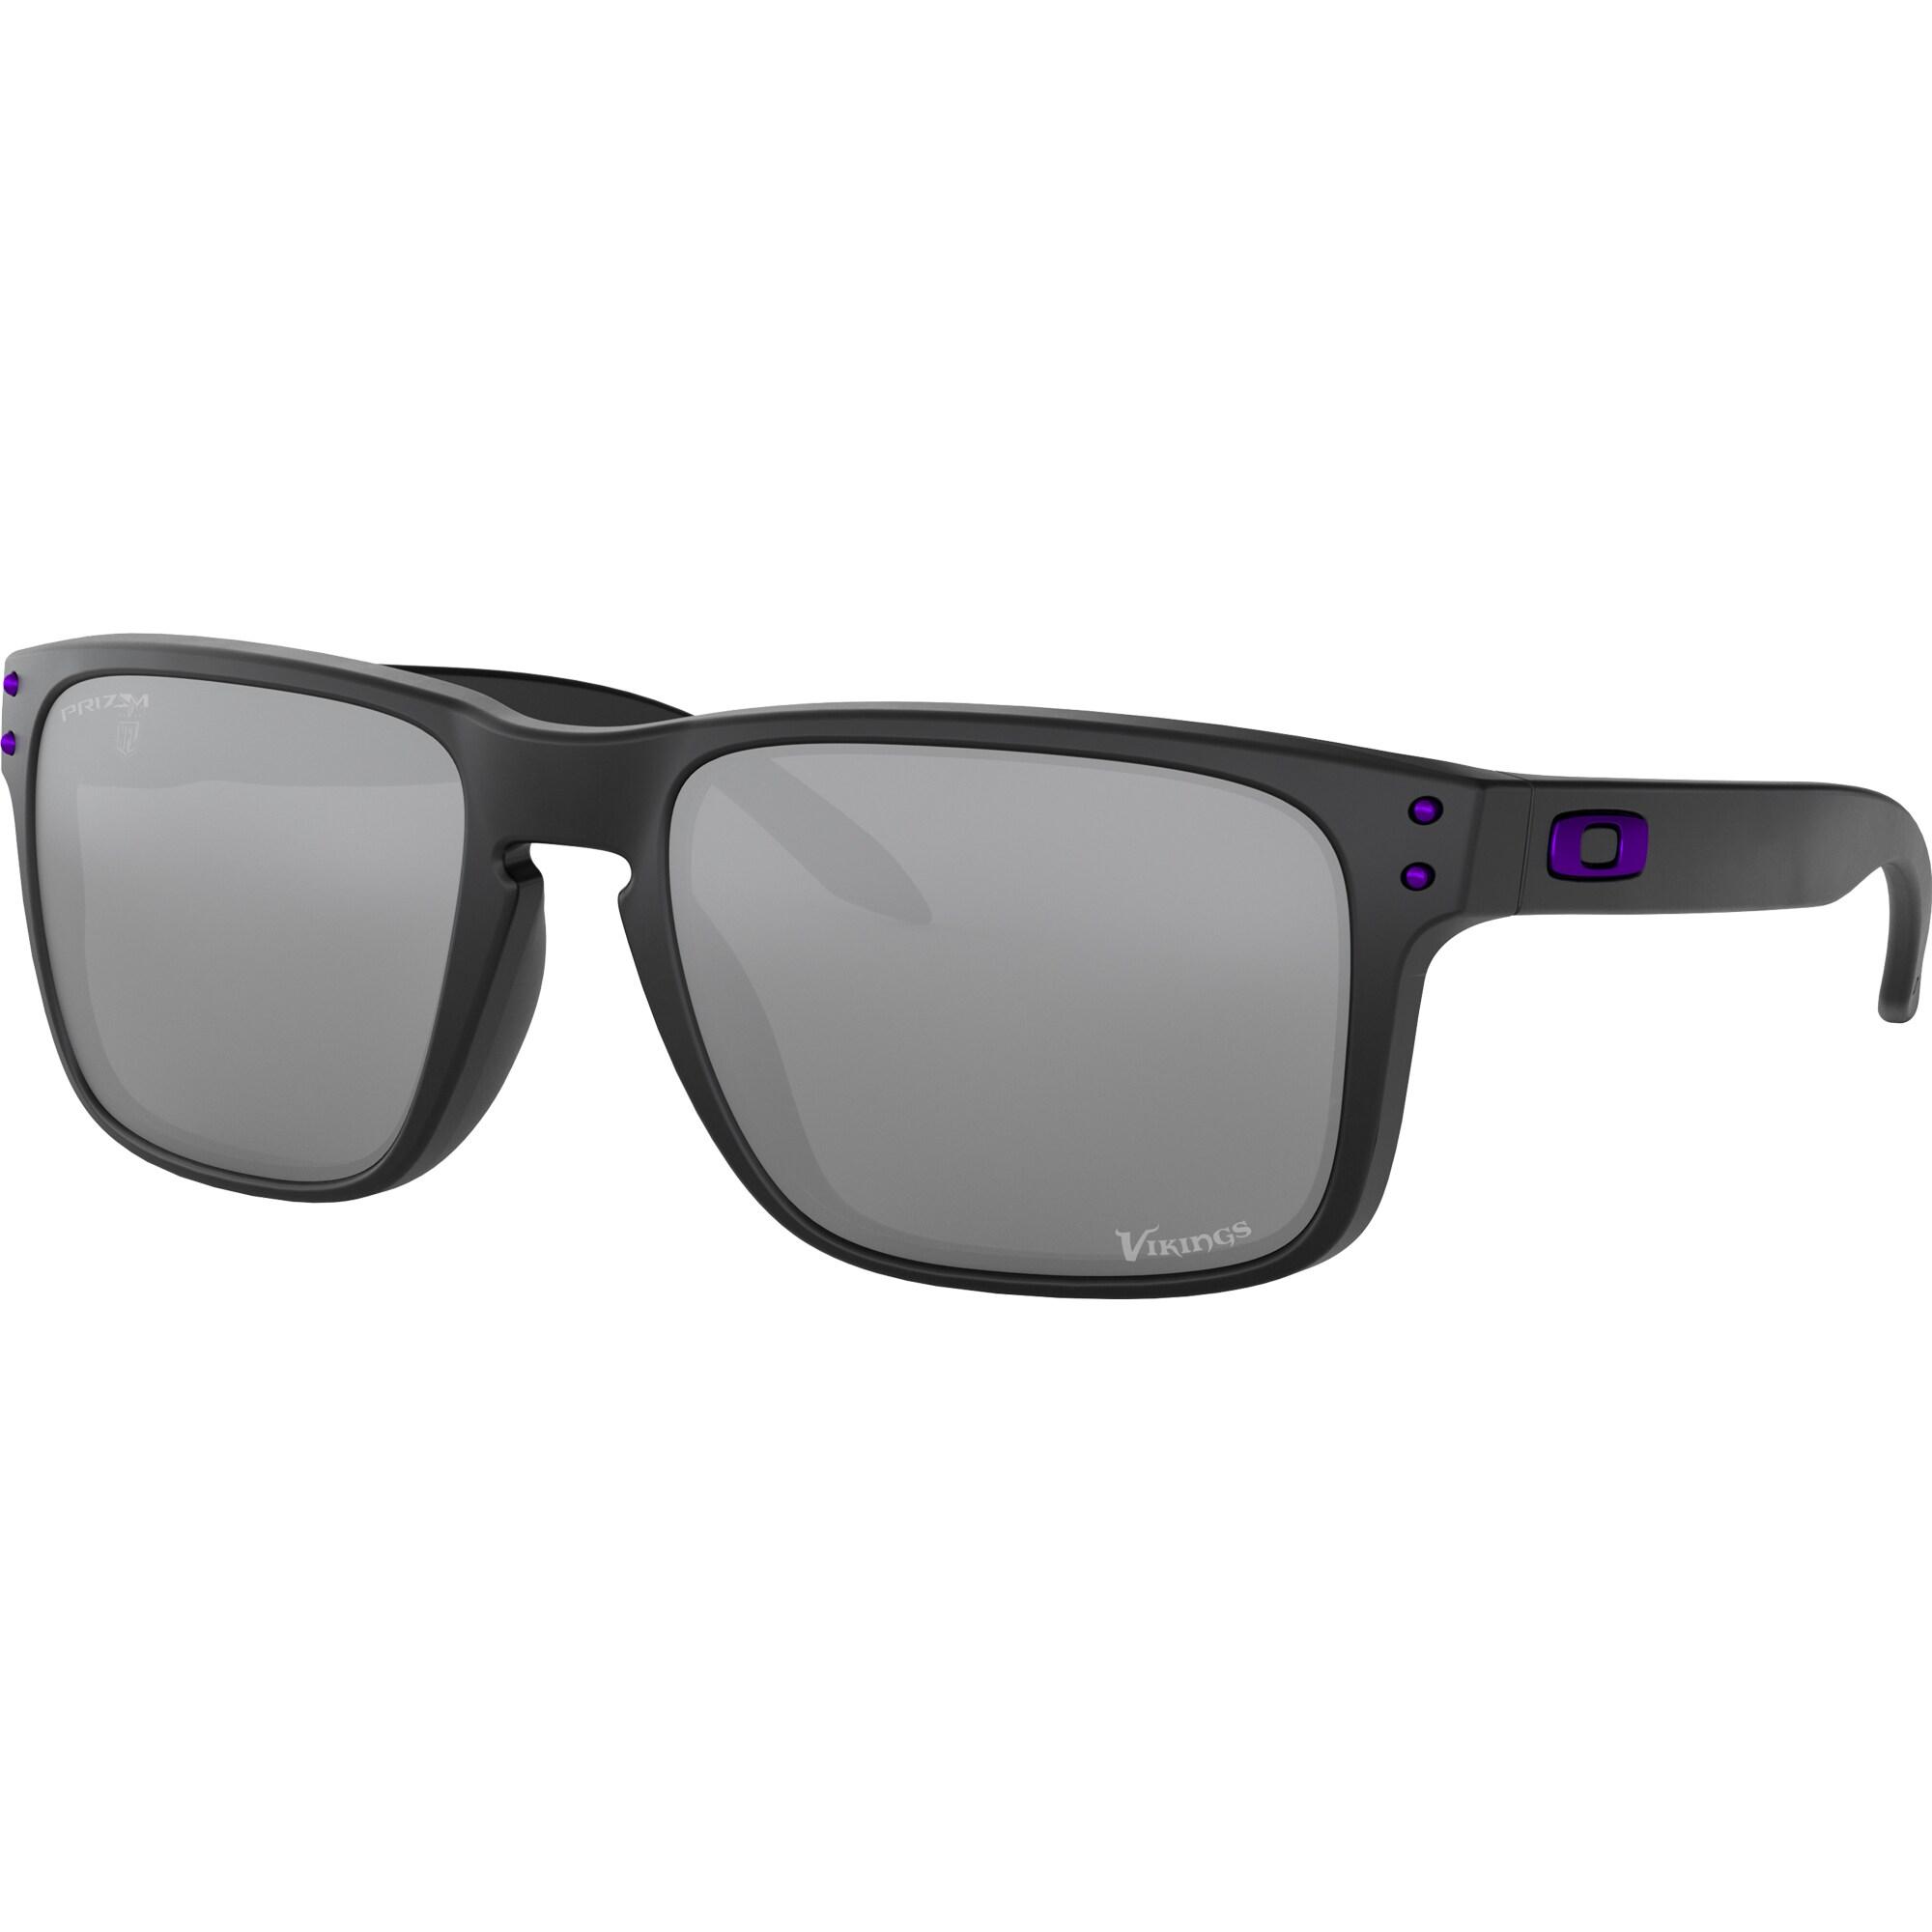 Minnesota Vikings Oakley Holbrook Sunglasses